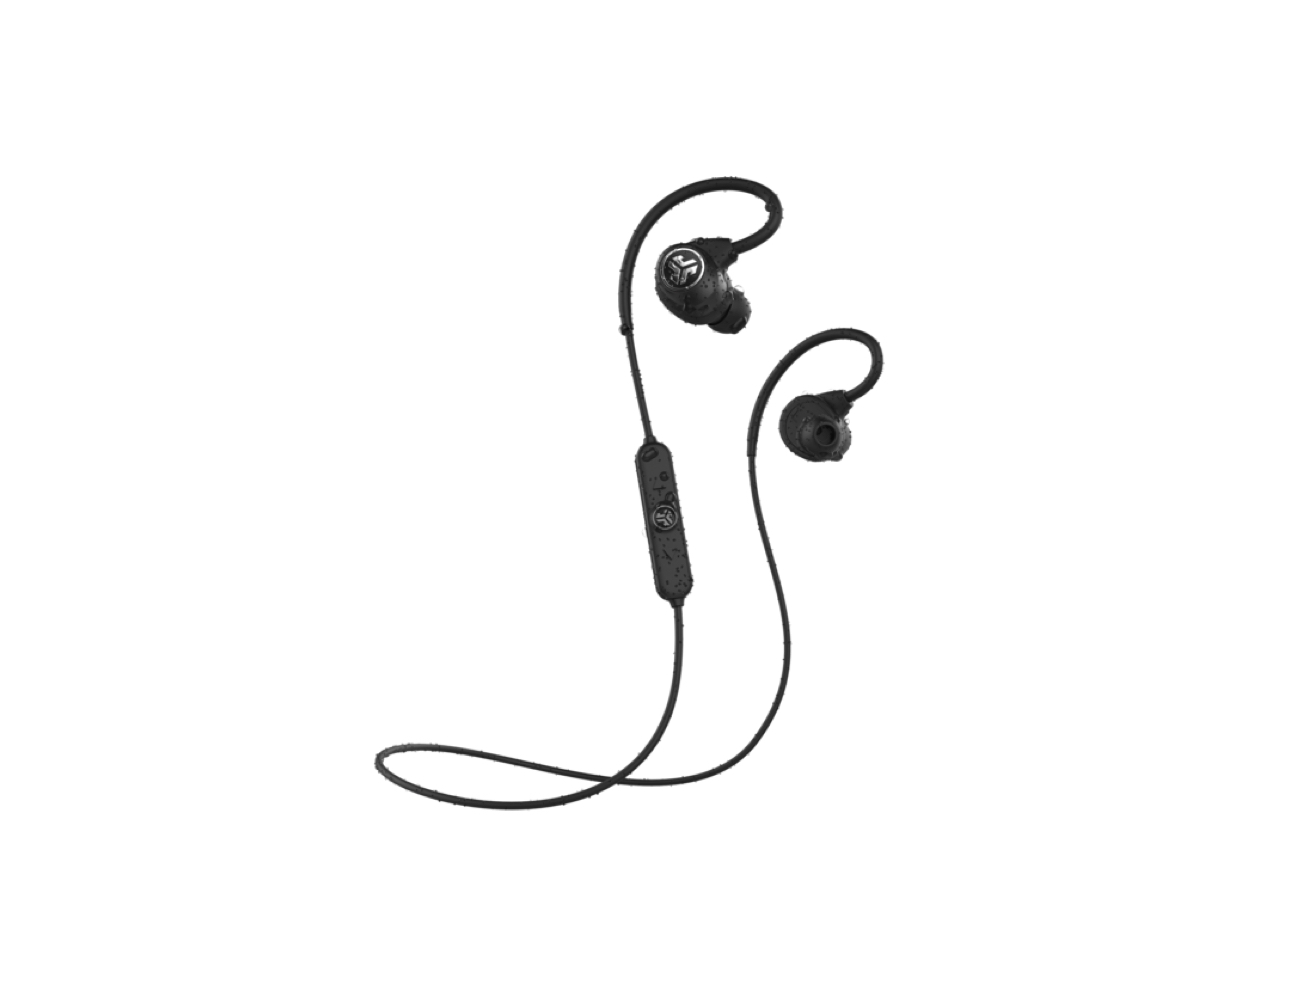 86d0c165de3 JLab Audio Epic Sport Wireless Earbuds » Gadget Flow